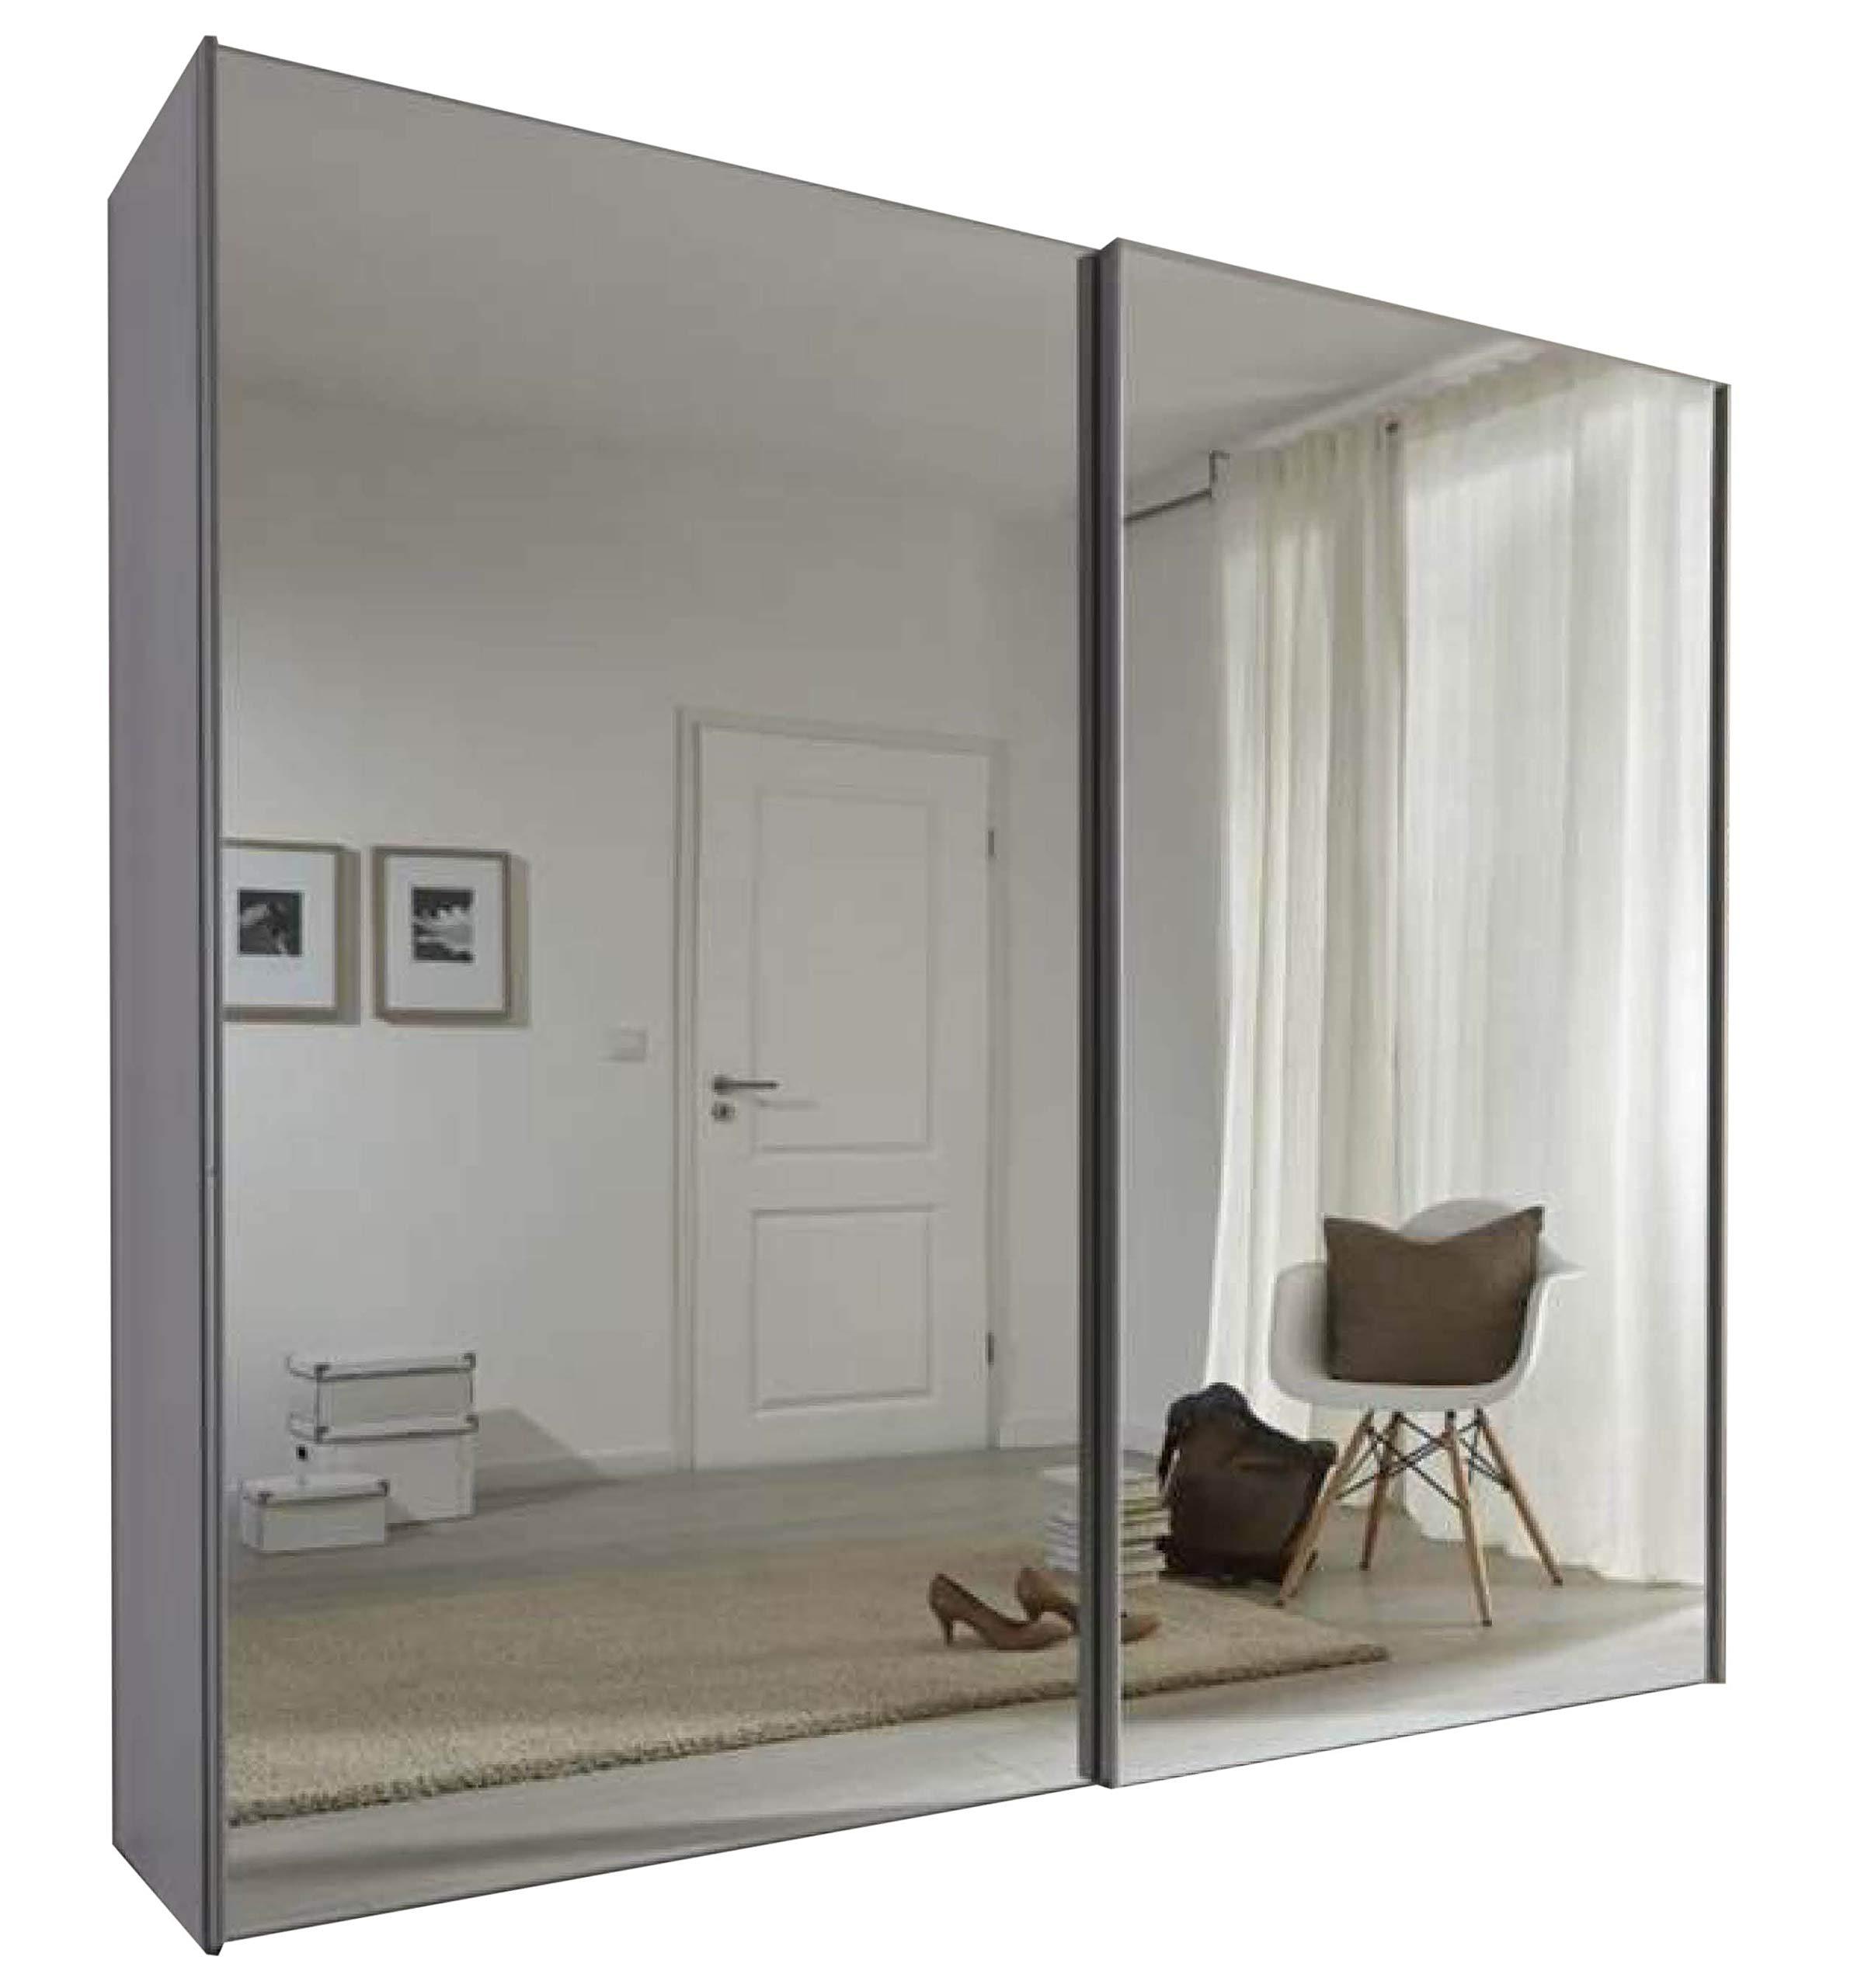 Displaycabinetsuk Komet White Mirror Sliding Door Wardrobe 236cm Wide German Made Bedroom Furniture Buy Online In Haiti At Haiti Desertcart Com Productid 65741931